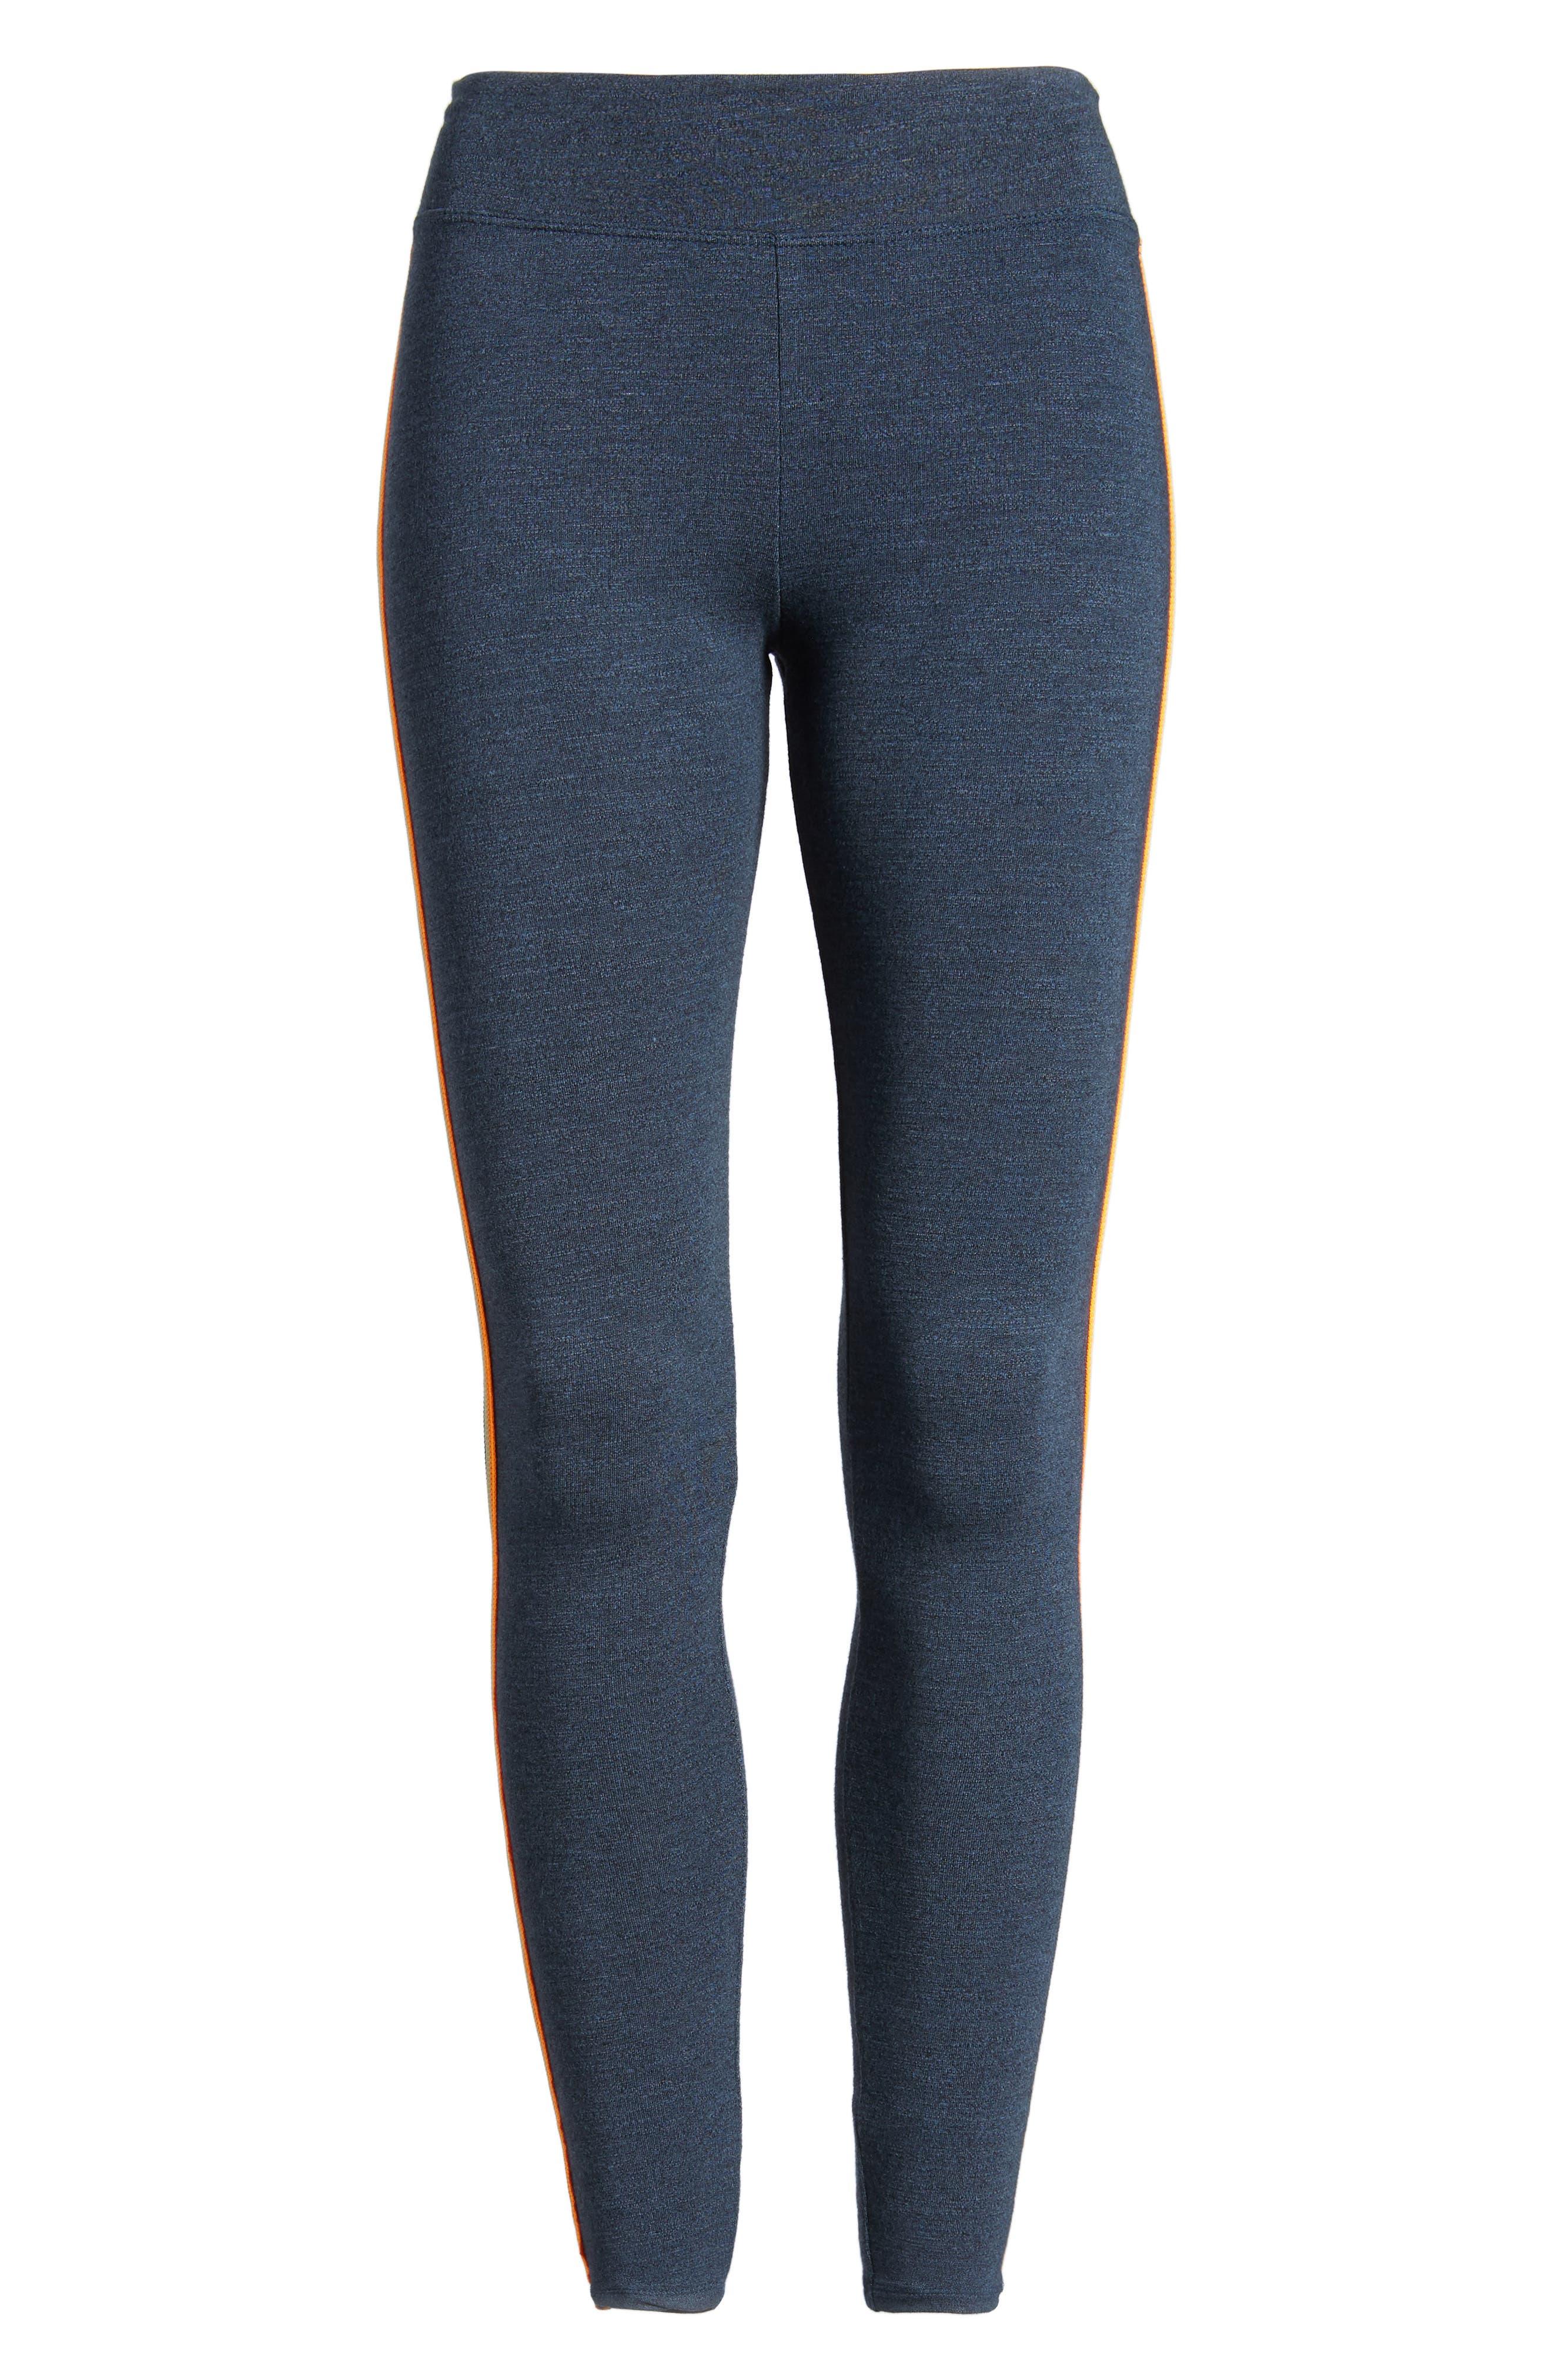 Side Stripe Yoga Pants,                             Alternate thumbnail 6, color,                             Navy